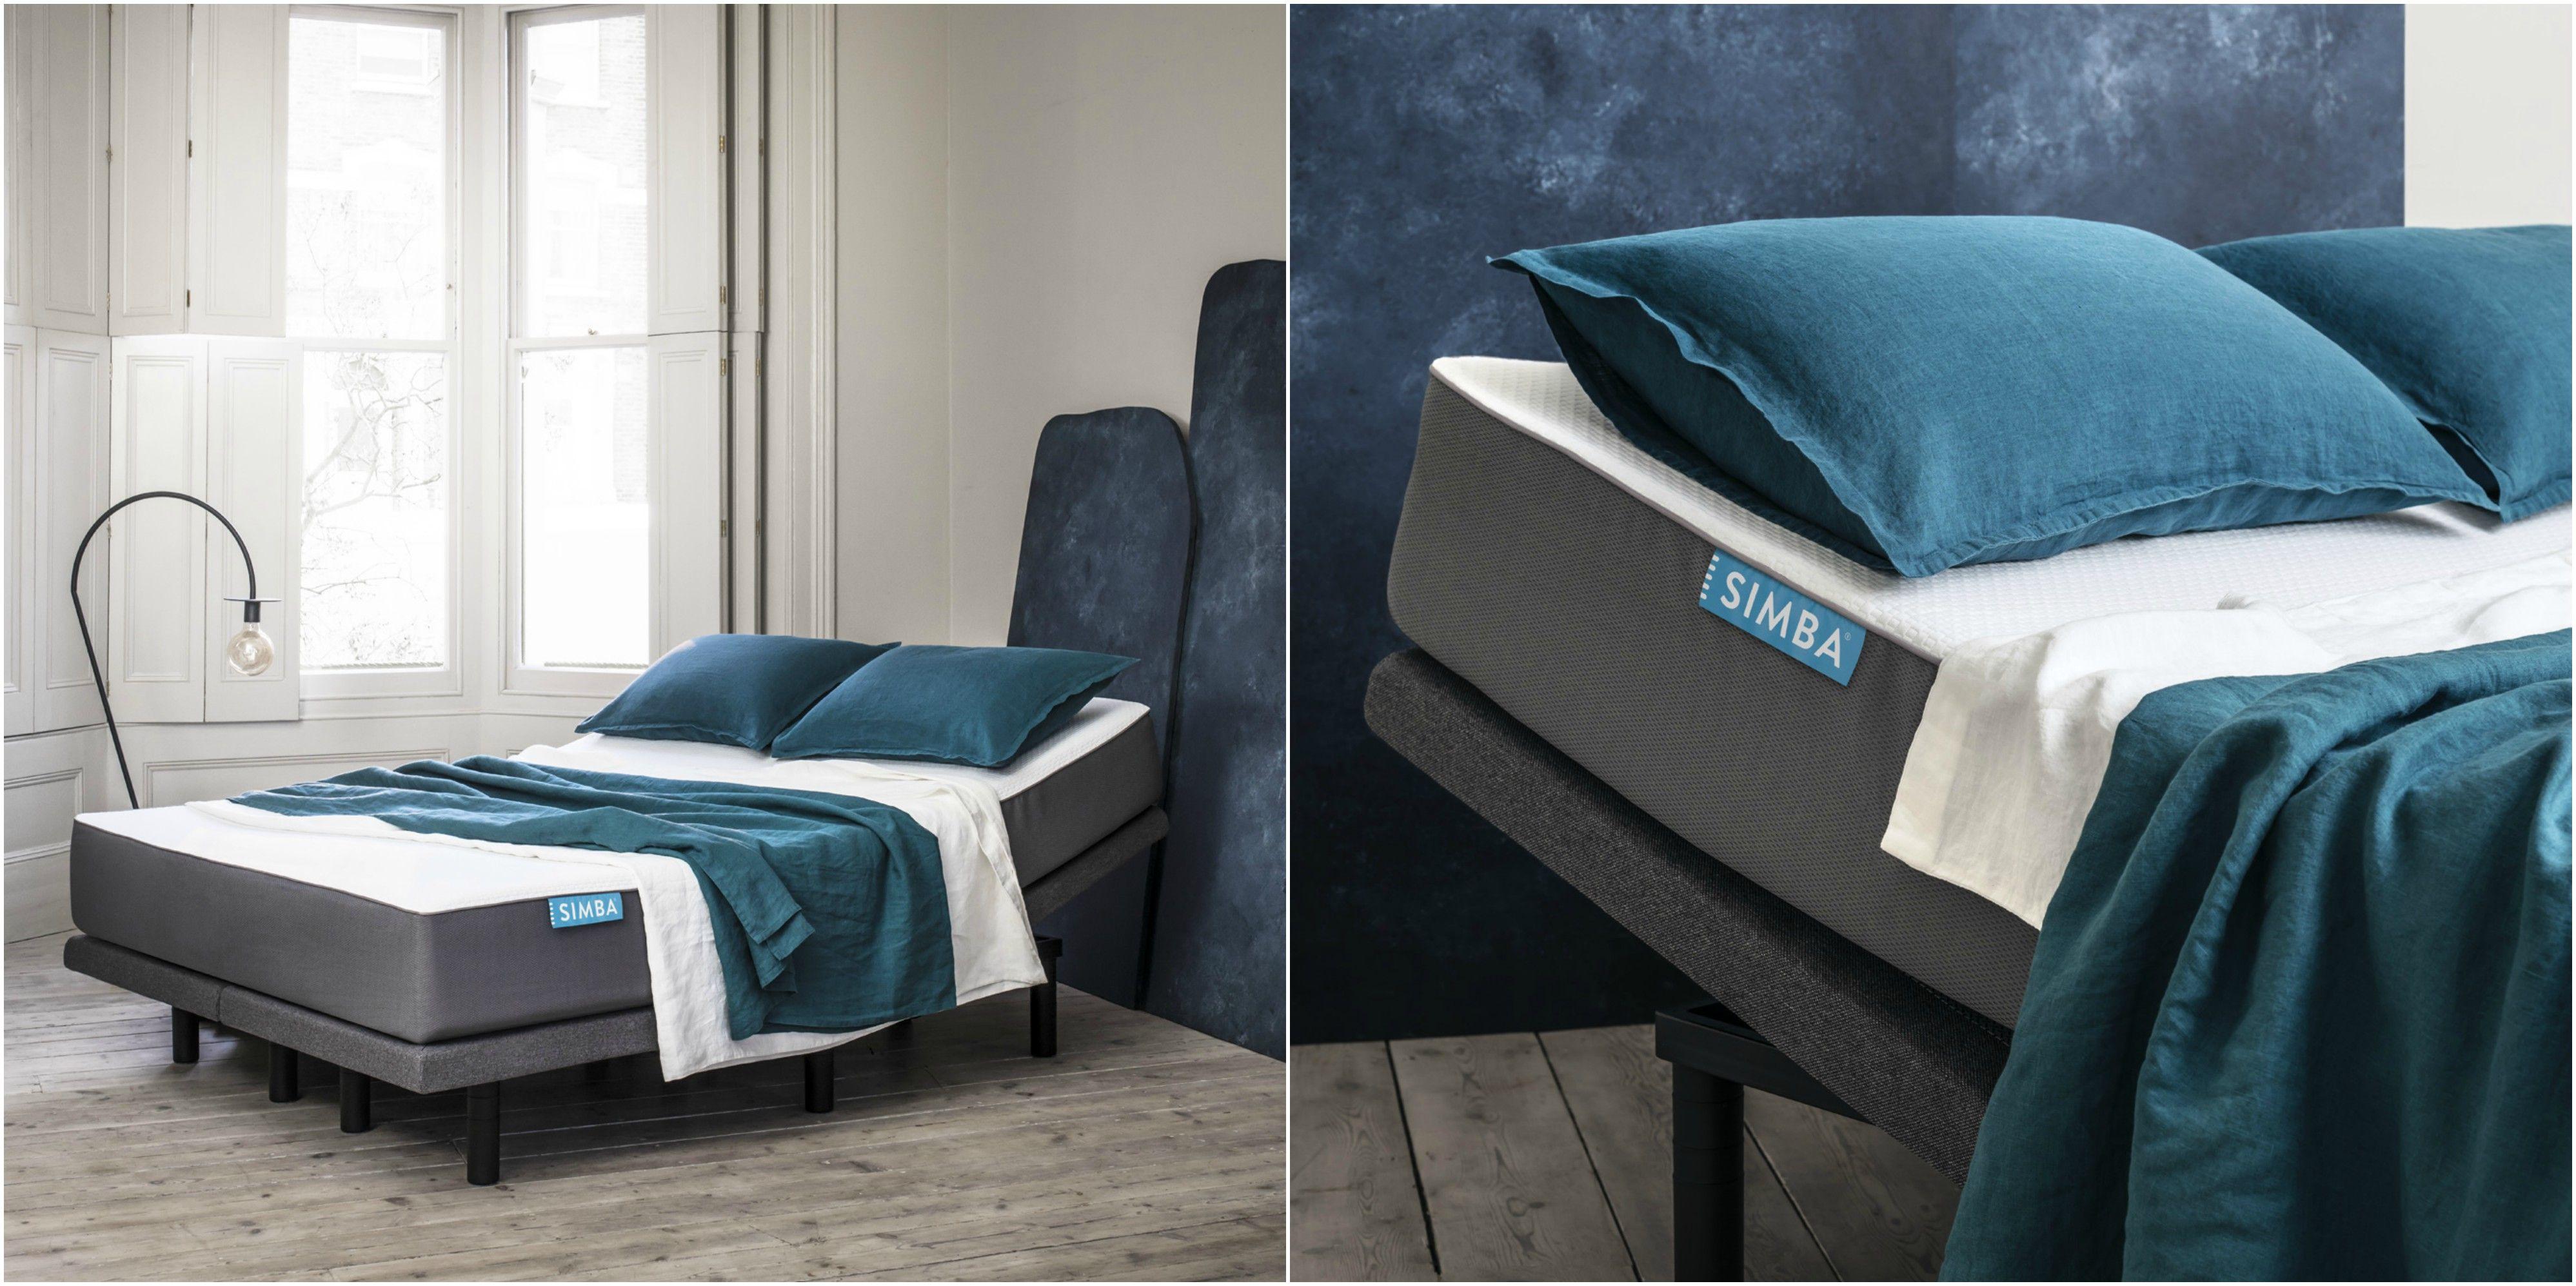 Simba Launches Adjustable Bed Base That Promotes Zero Gravity Like Sleep